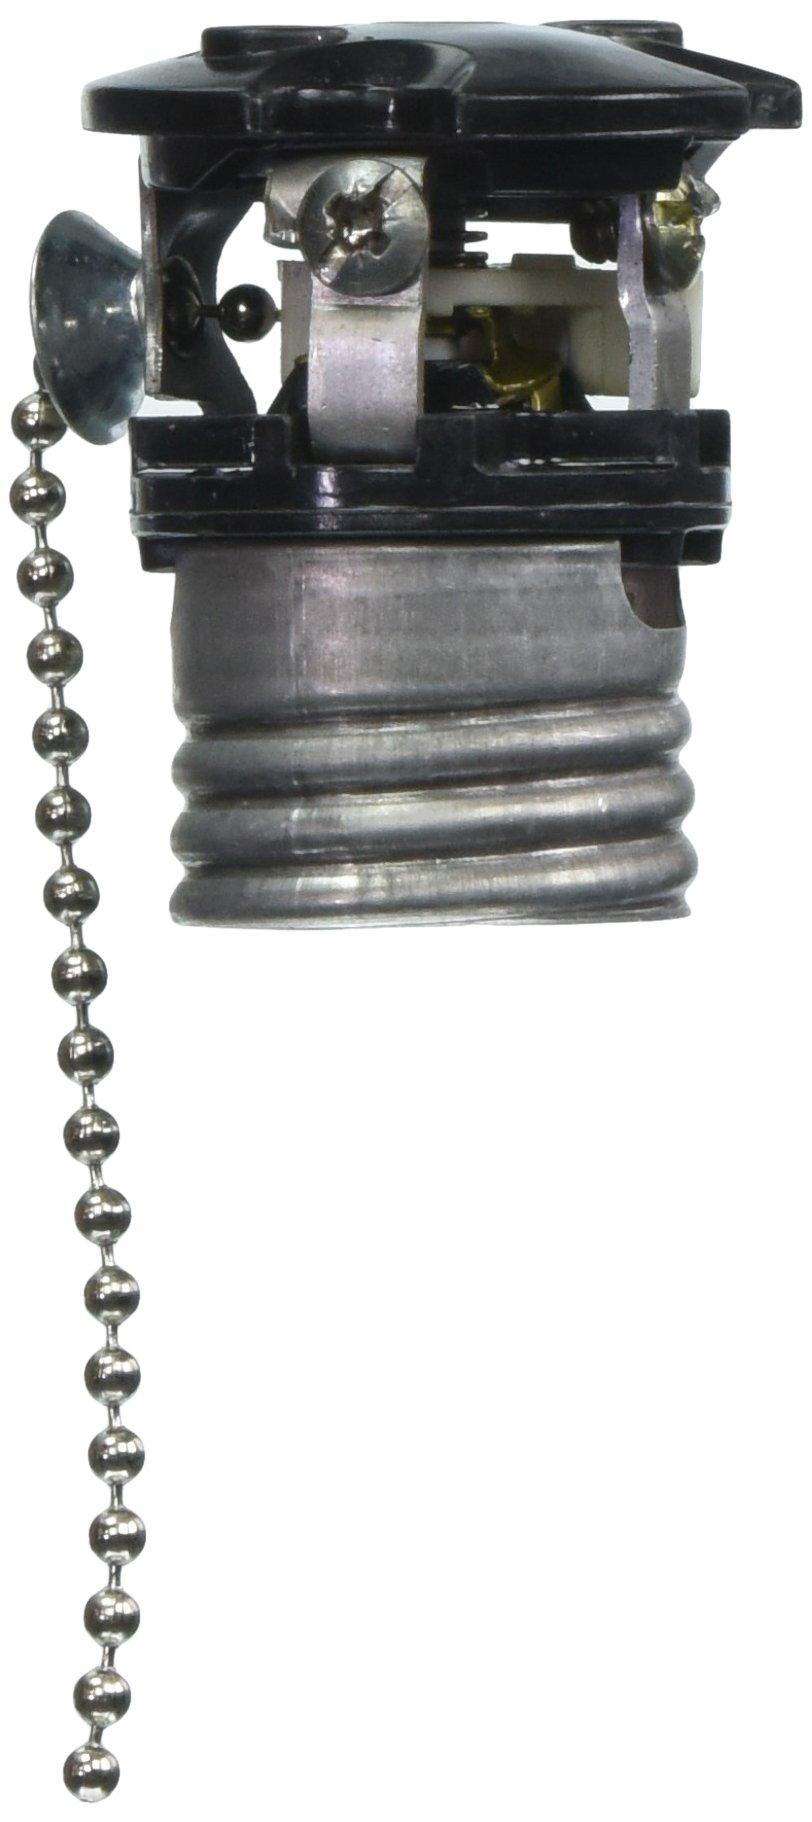 Leviton 9814-M Medium Base Interior Only, Shell Incandescent Lampholder, Pull Chain, Single Circuit